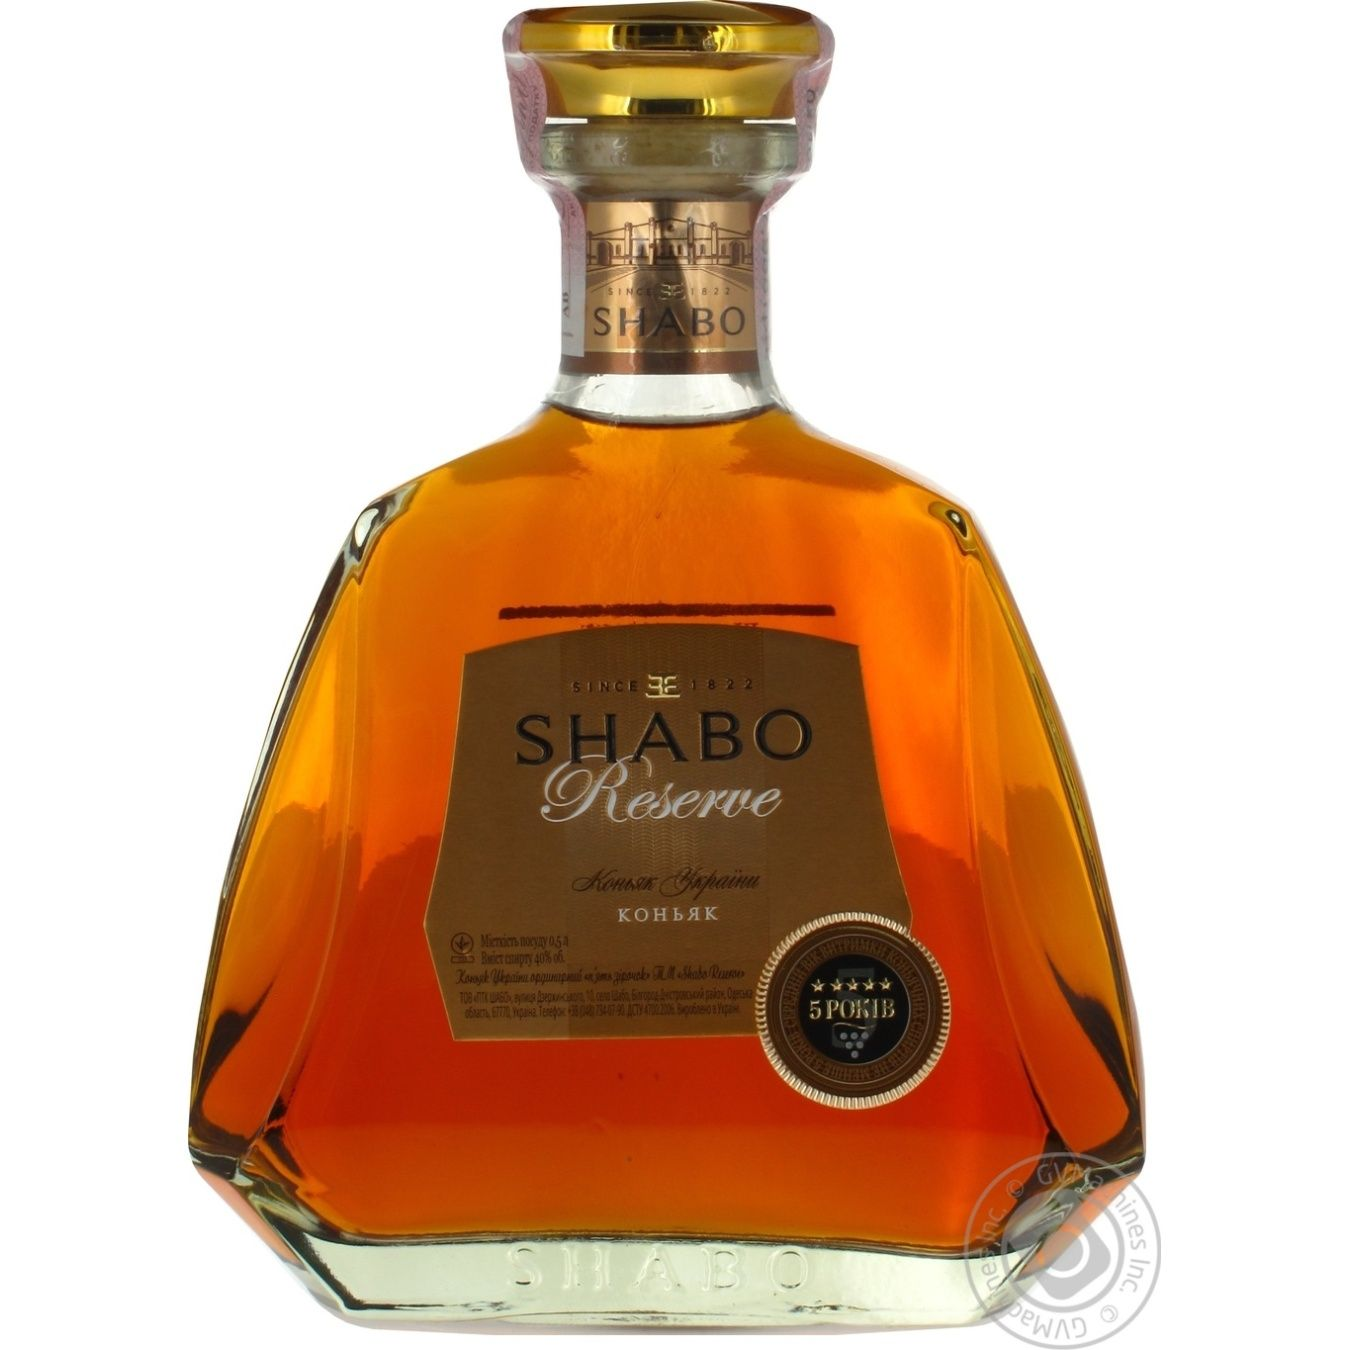 Cognac shabo 40 500ml glass bottle drinks 18 for Cognac auchan